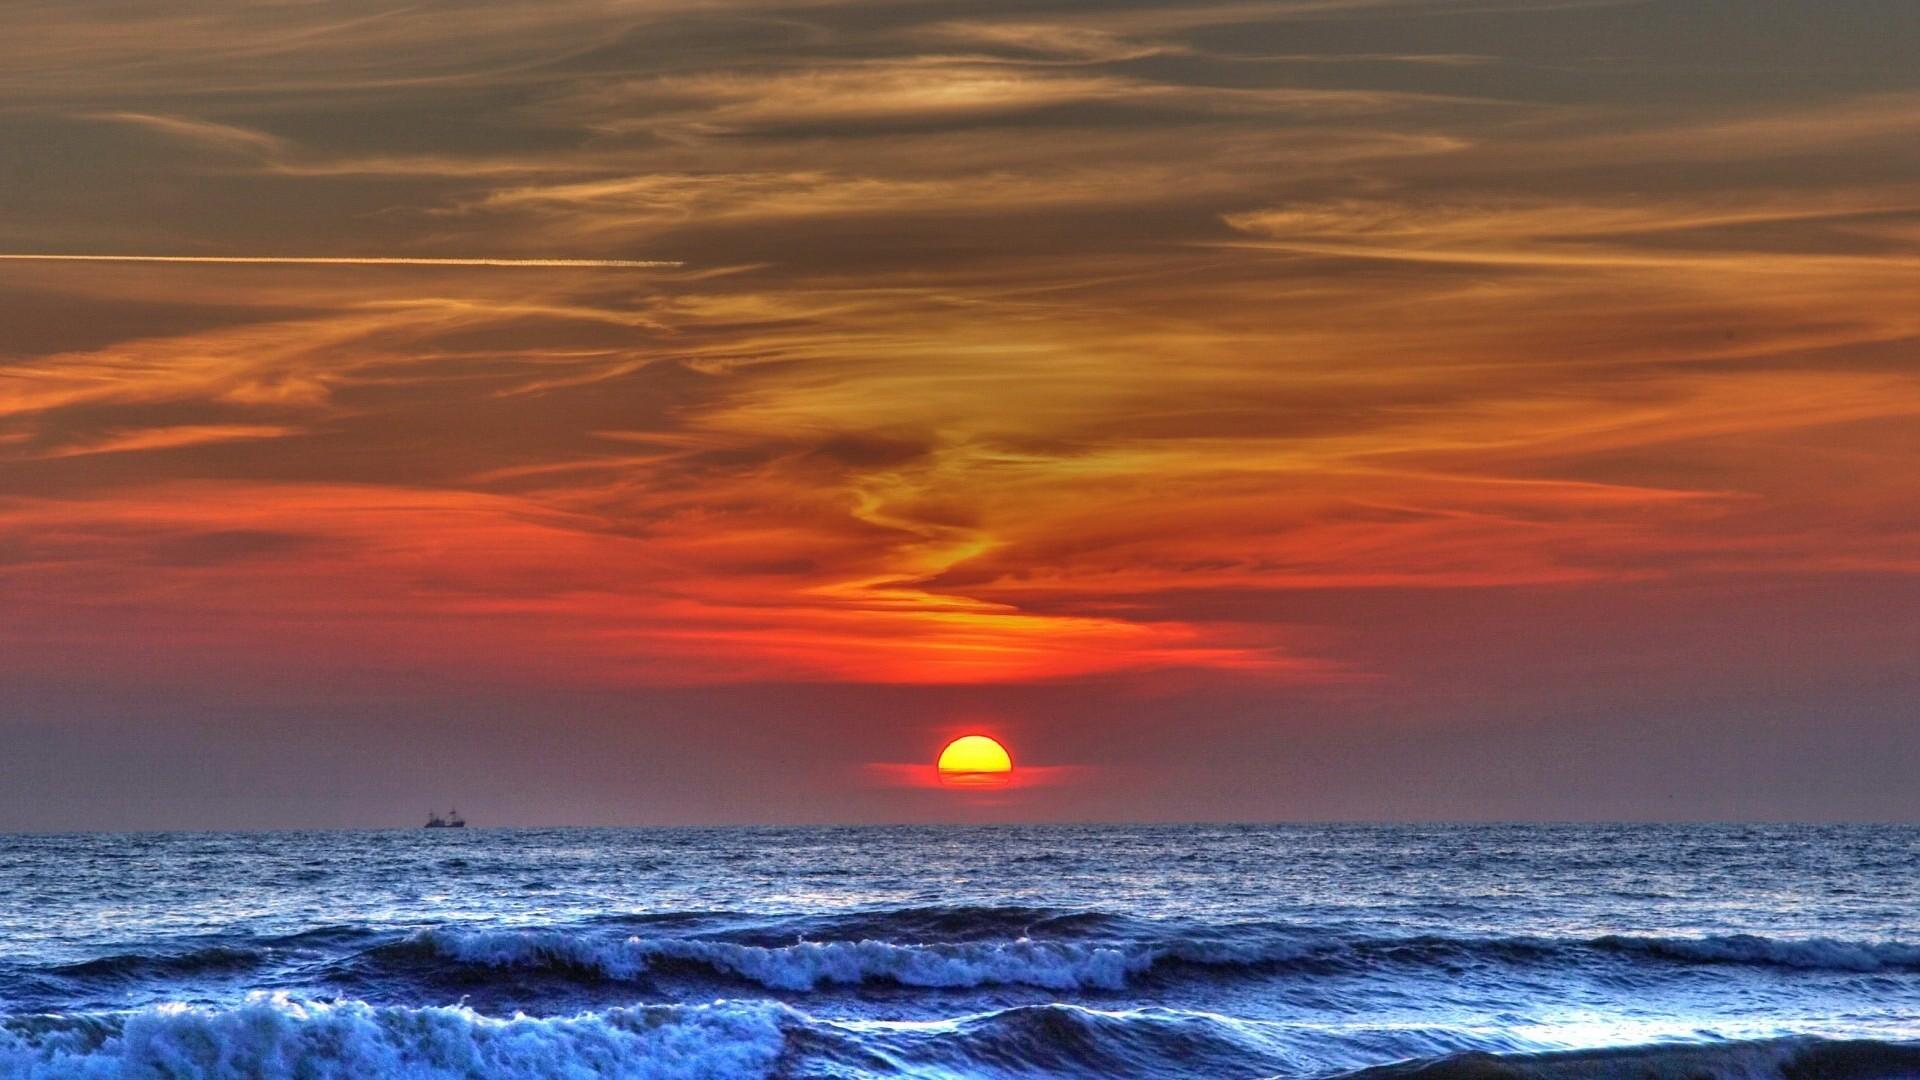 Sfondi bellissimi 79 immagini for Paesaggi bellissimi per desktop